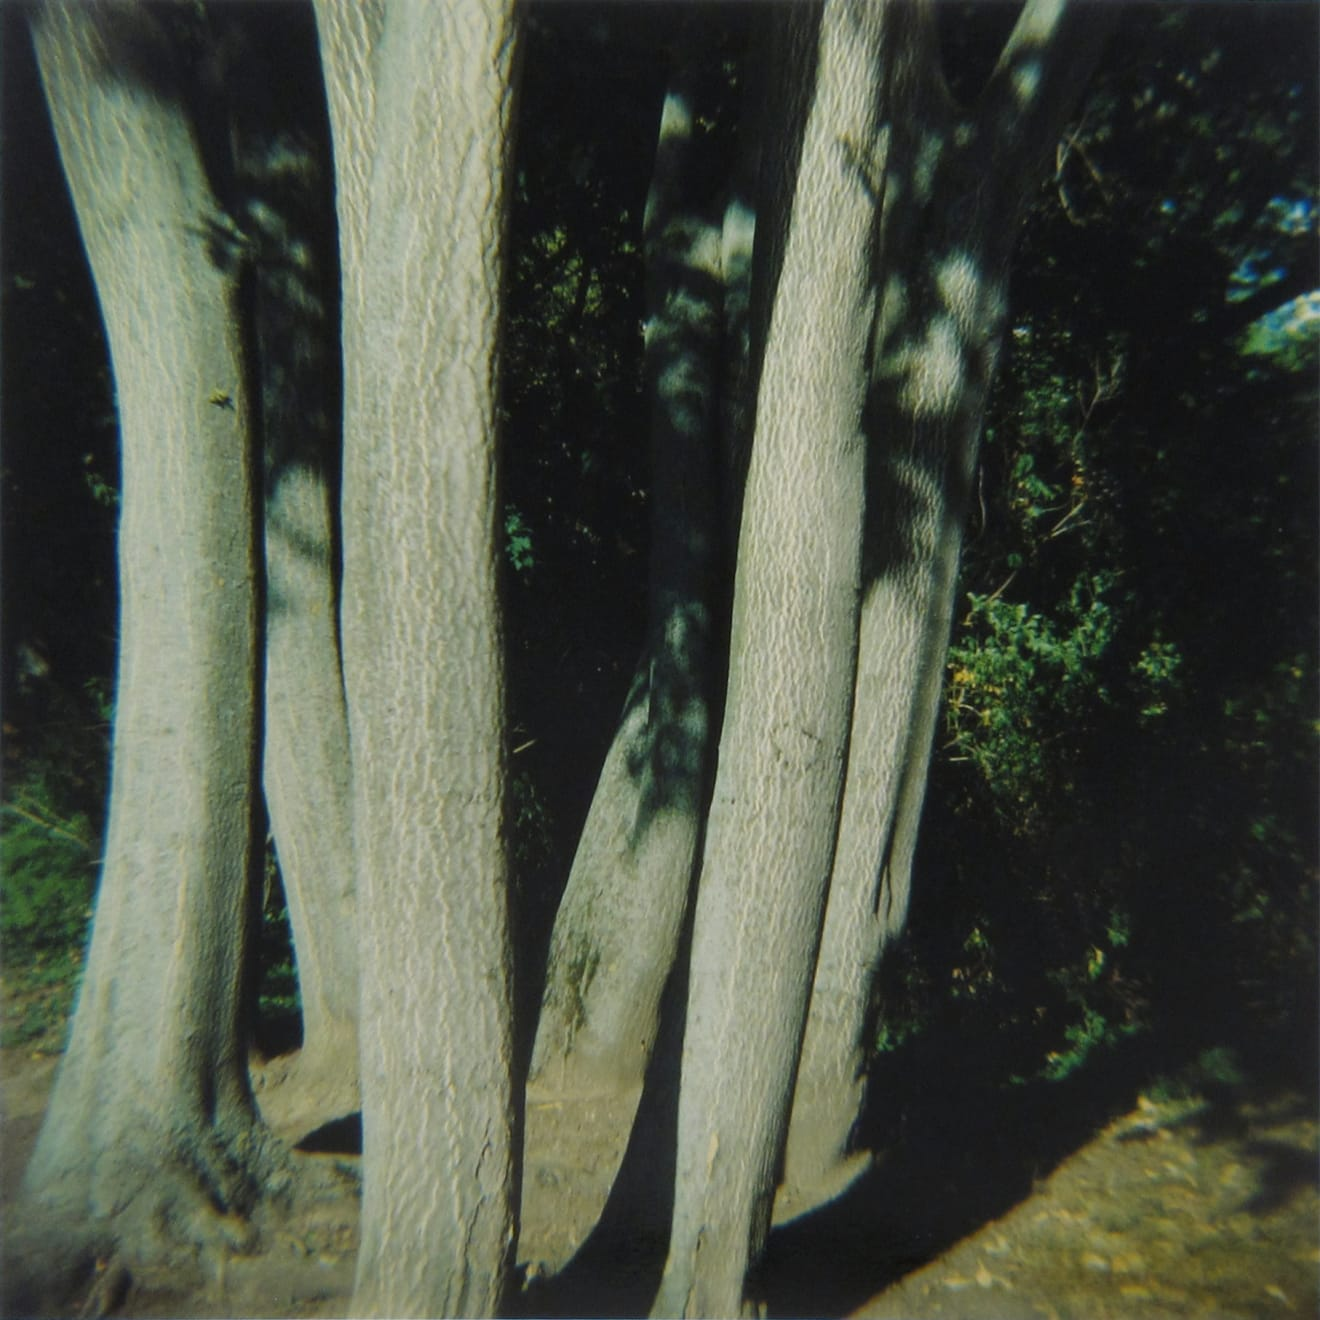 Amy Blakemore Skinny Trees, 2018 chromogenic print 15 x 15 in (38.1 x 38.1 cm) ABL 259 $3,000